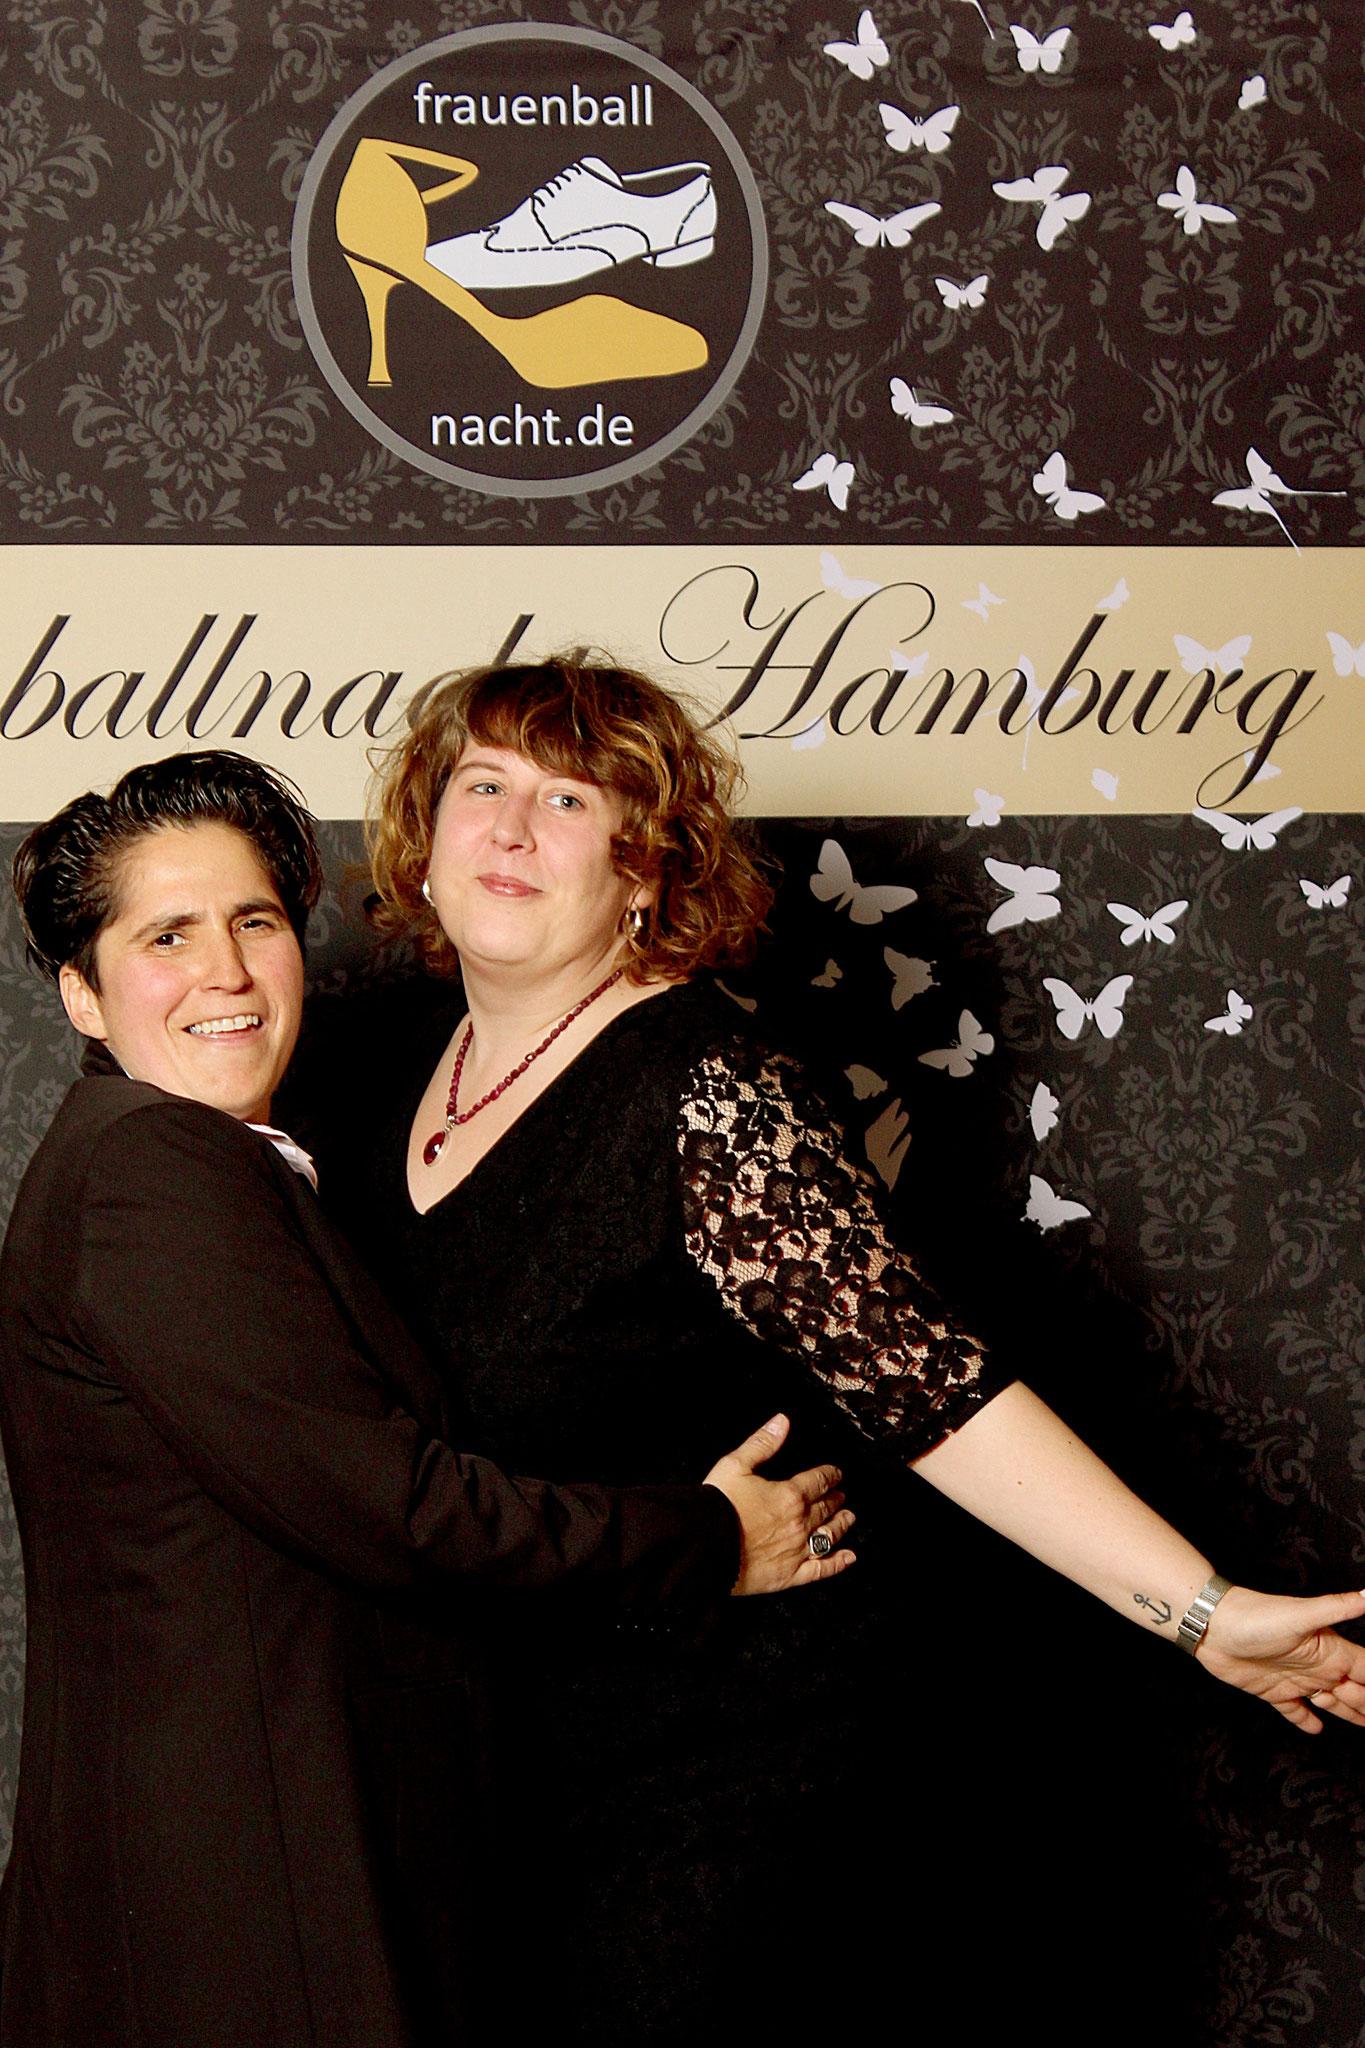 Veranstalterin & DJanes Denise Lau und Alex Baas (pic by Oxana Kessler) / Alexander Potapov – Fotolia (woman butterflies)